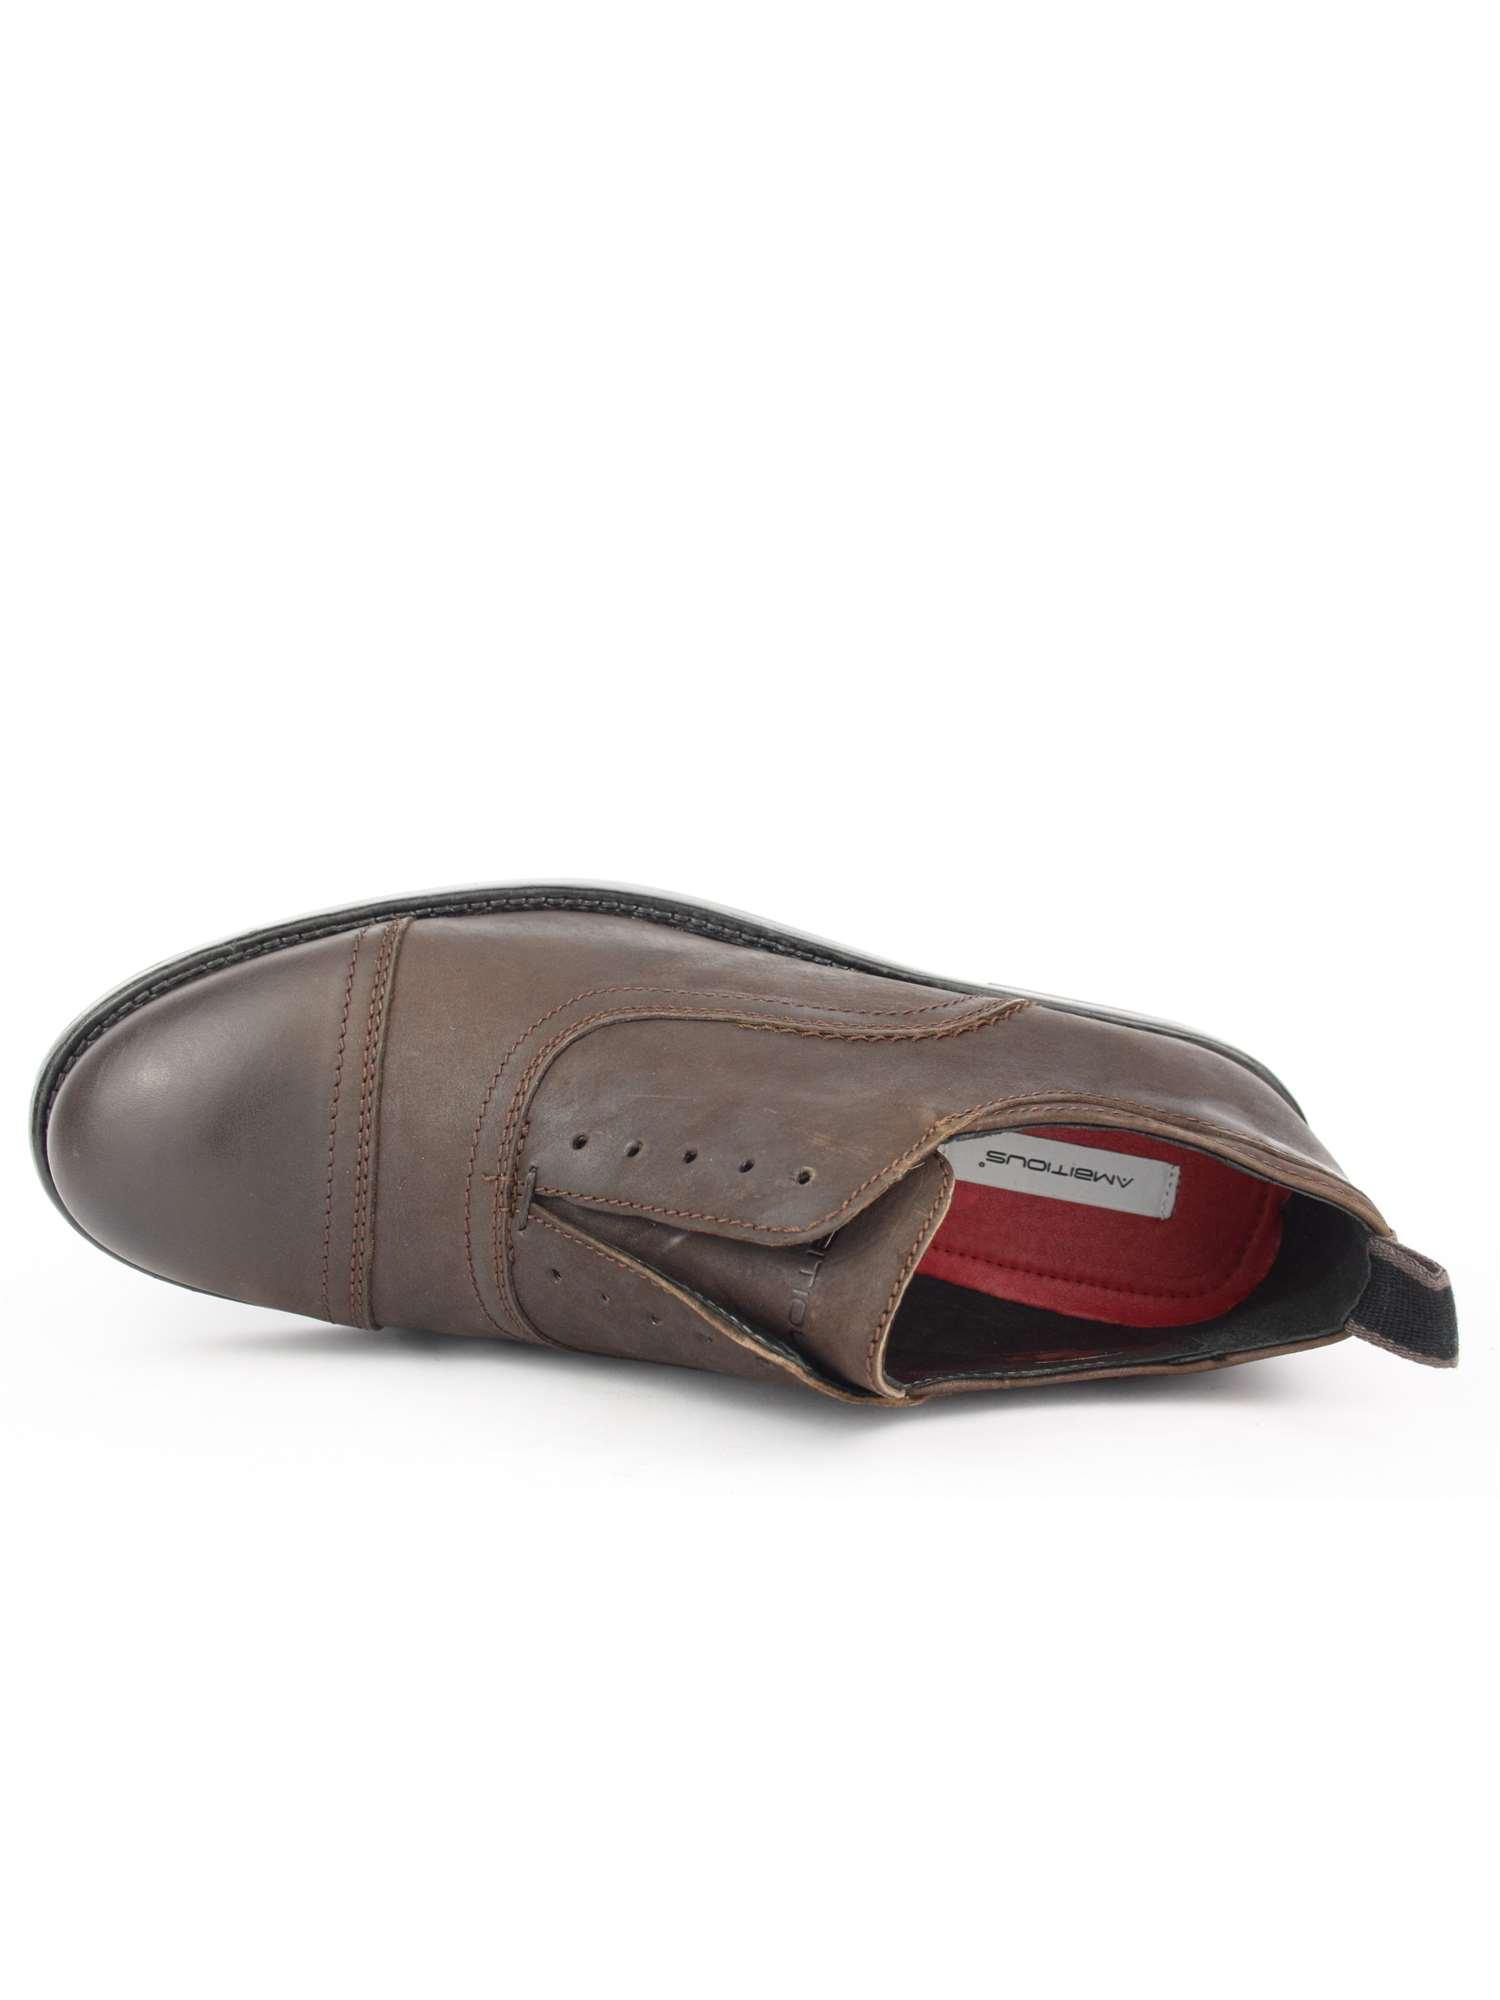 Ambitious Shoes 6844 T.moro Scarpe Uomo f7f5e53a265